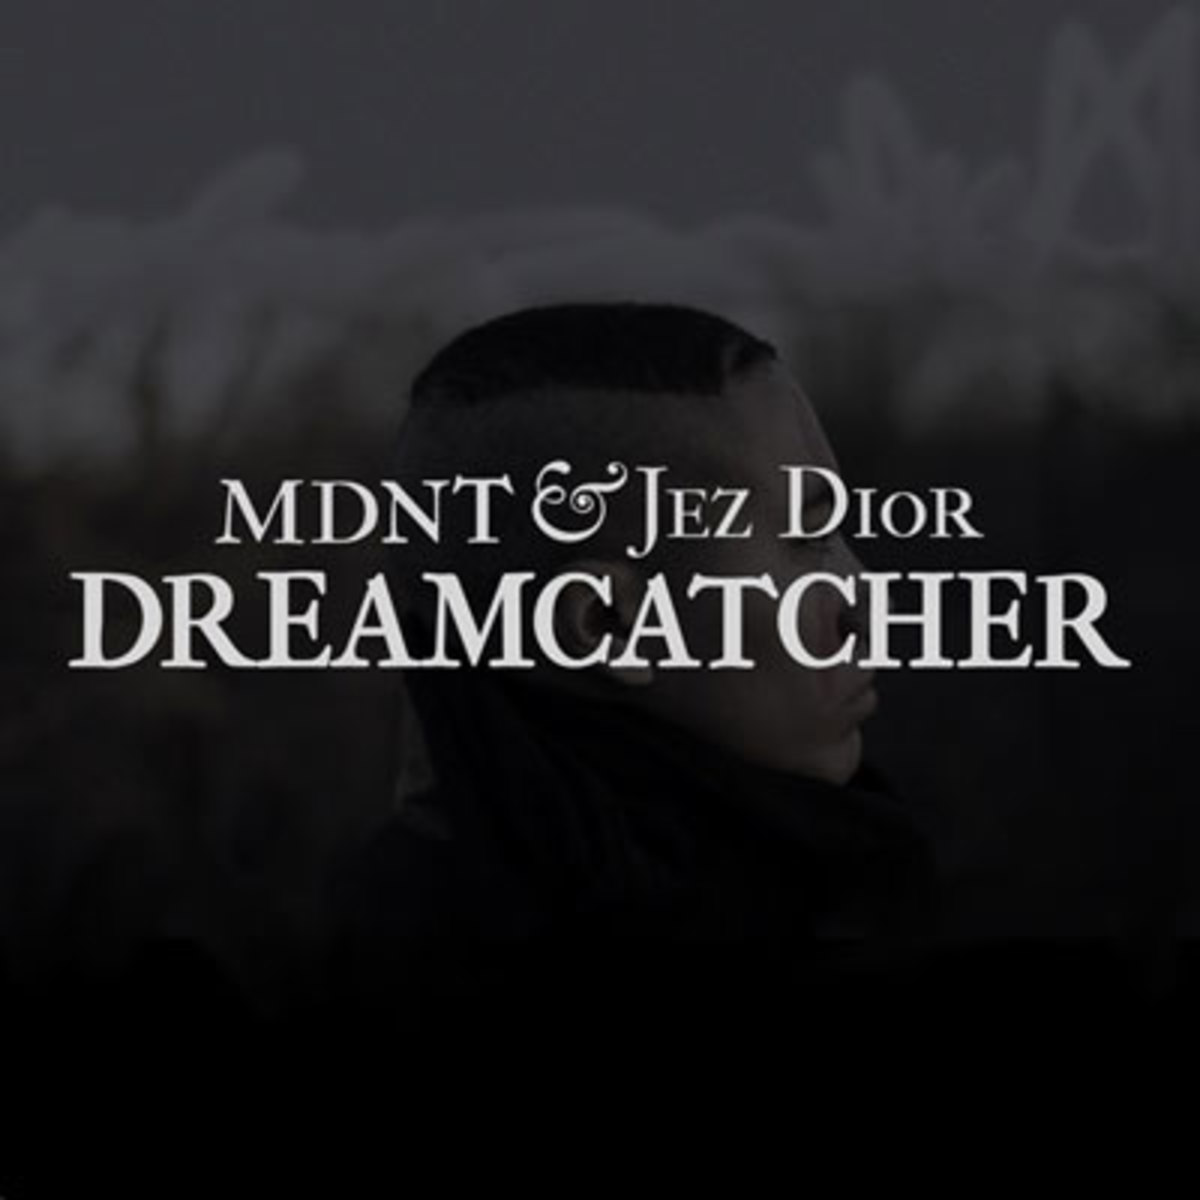 mdnt-dreamcatcher.jpg